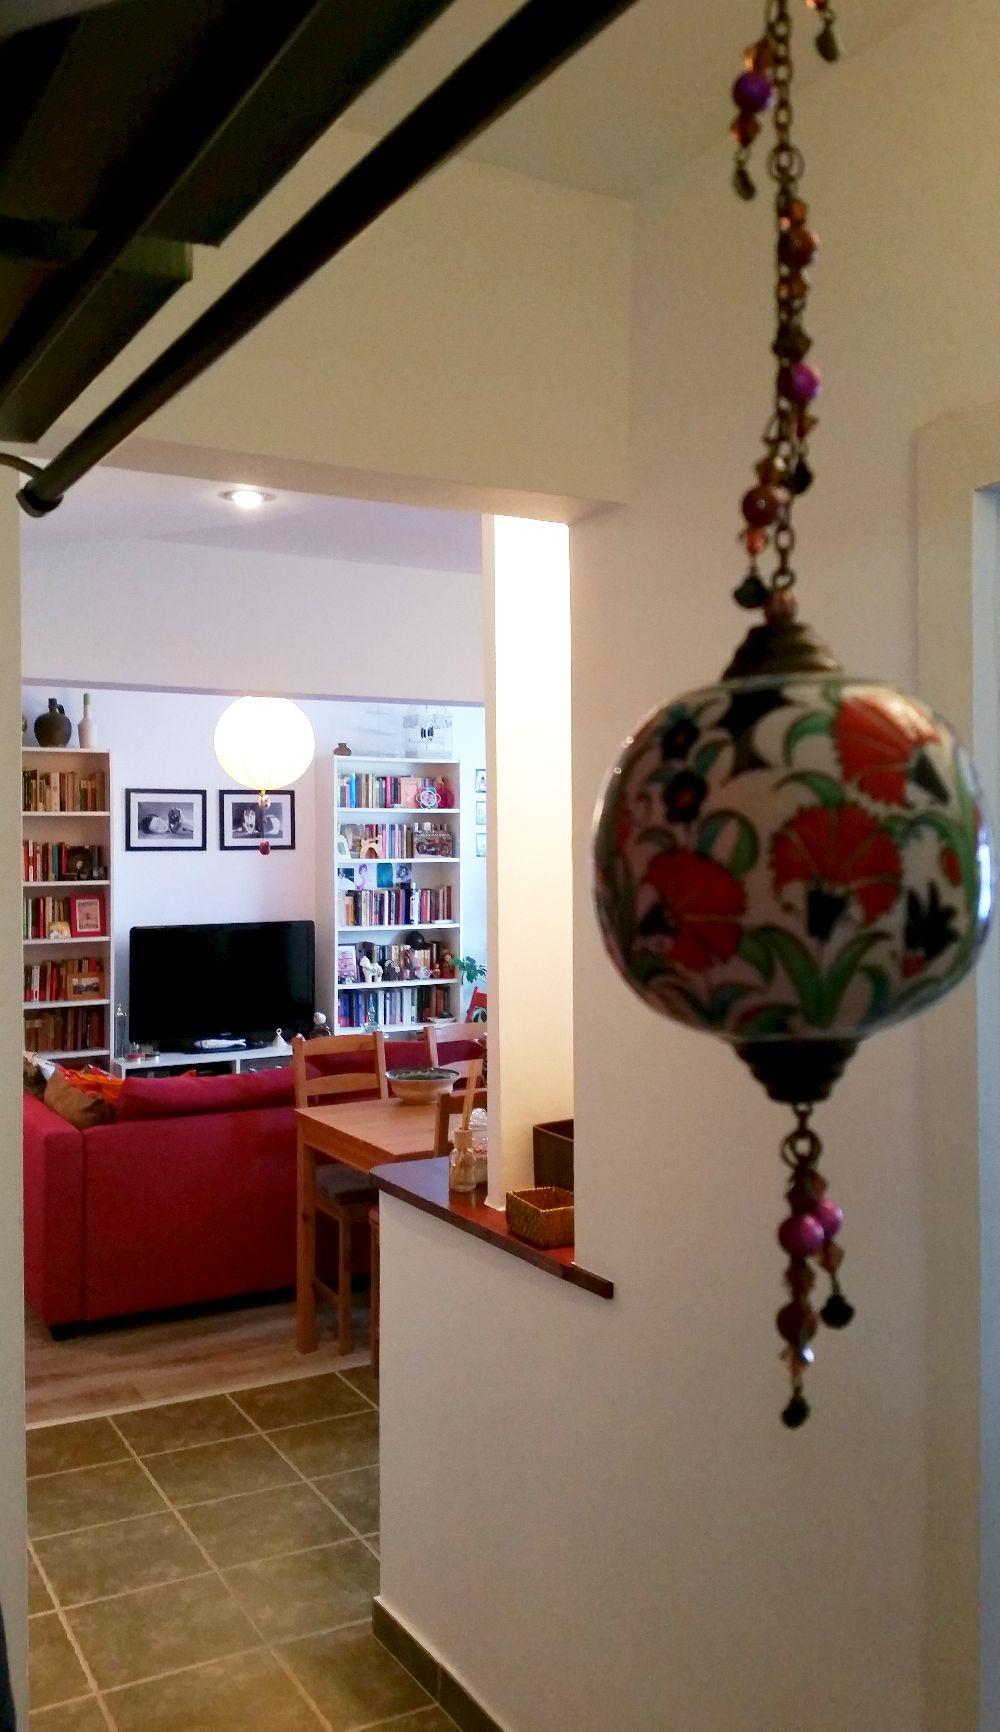 adelaparvu.com despre apartament 3 camere colorat in Sibiu, Foto Adela Parvu (31)